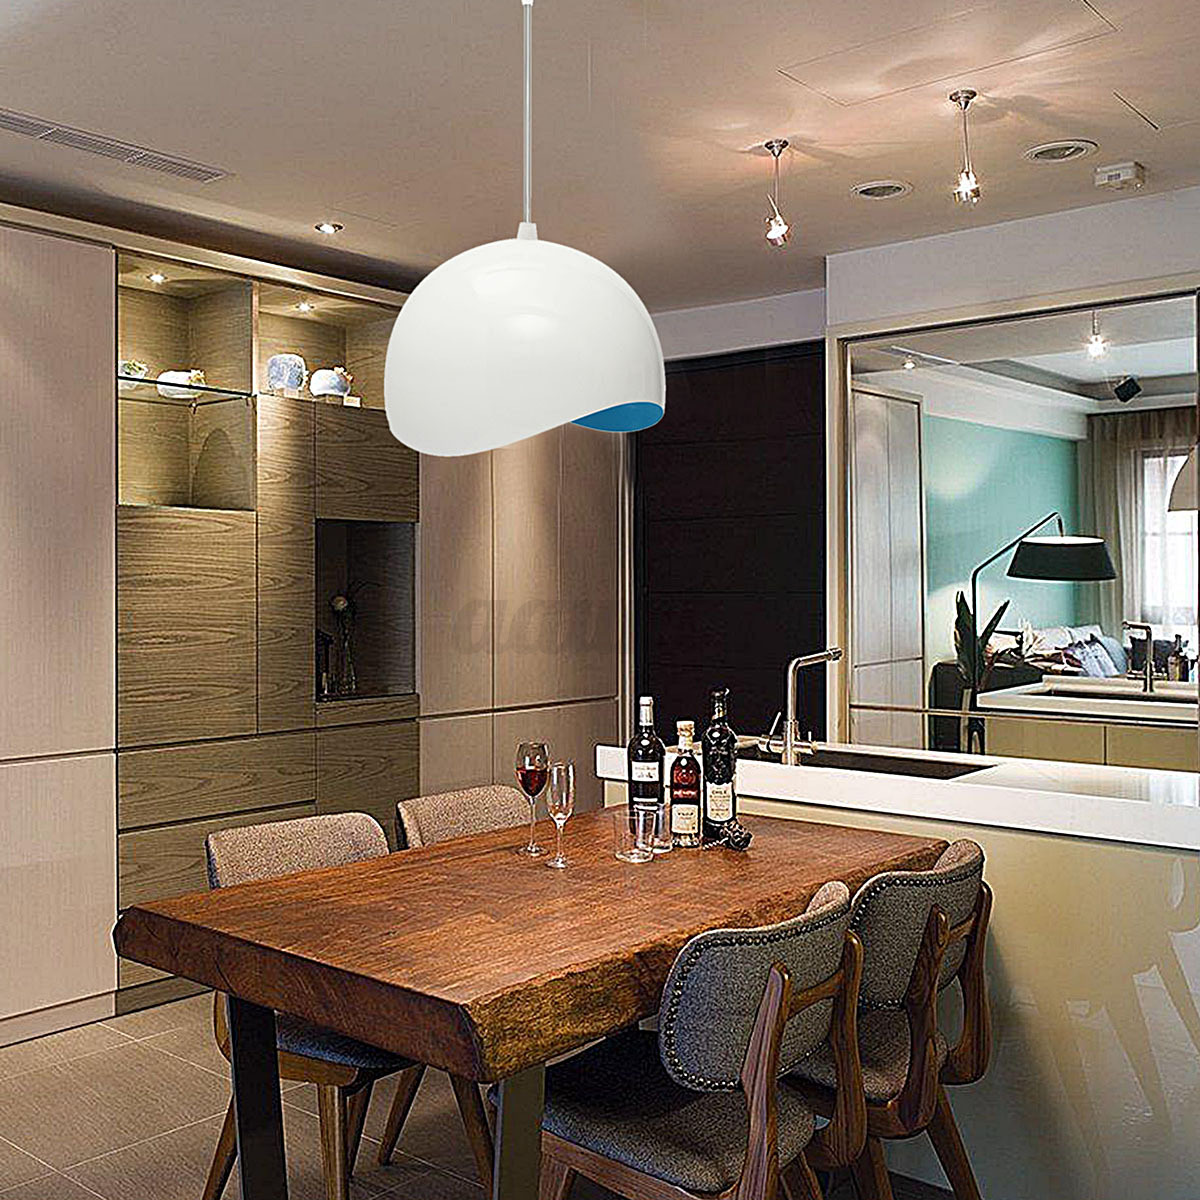 Country Kitchen Lighting: Modern Country Style Retro Eggshell Pendant Ceiling Light